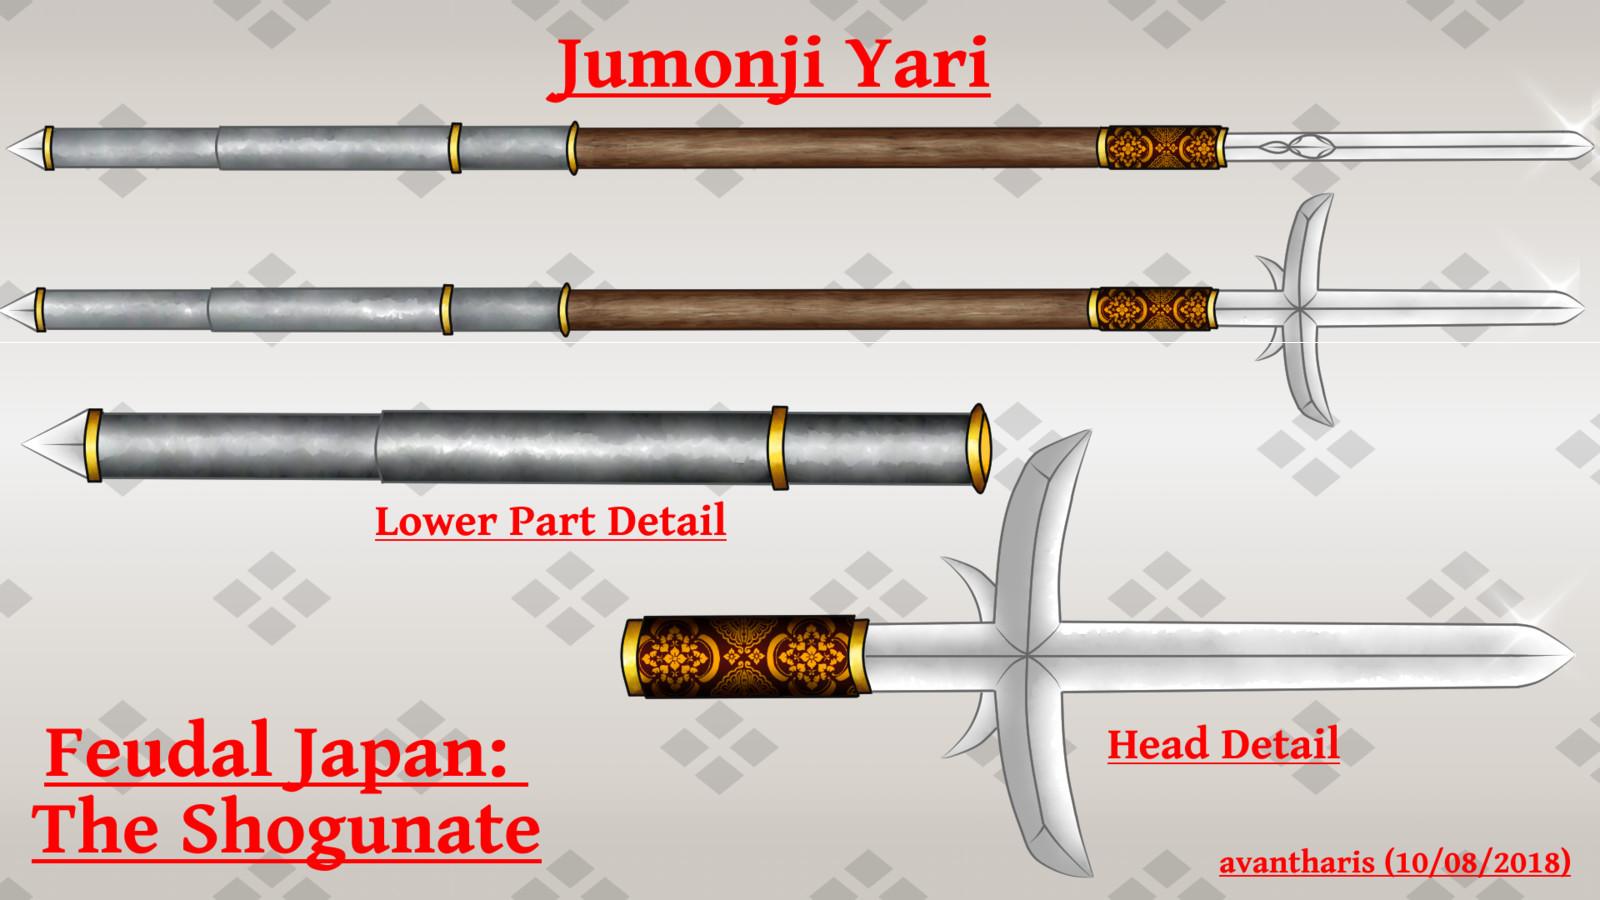 Jumonji Yari